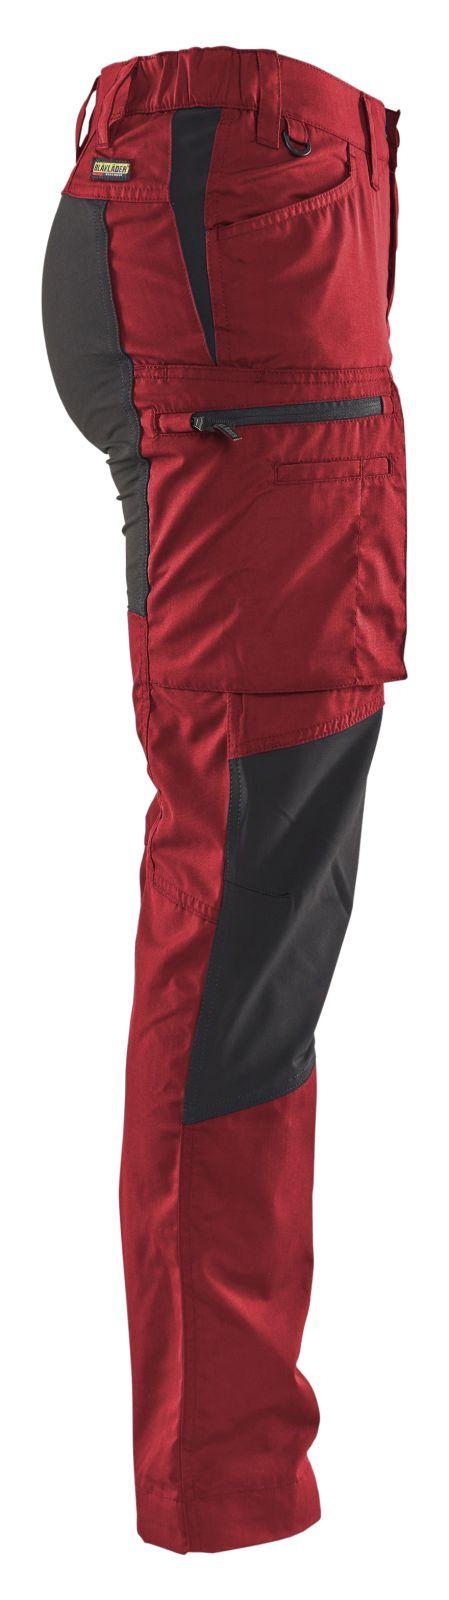 Blaklader Dames werkbroeken 71591845 rood-zwart(5699)